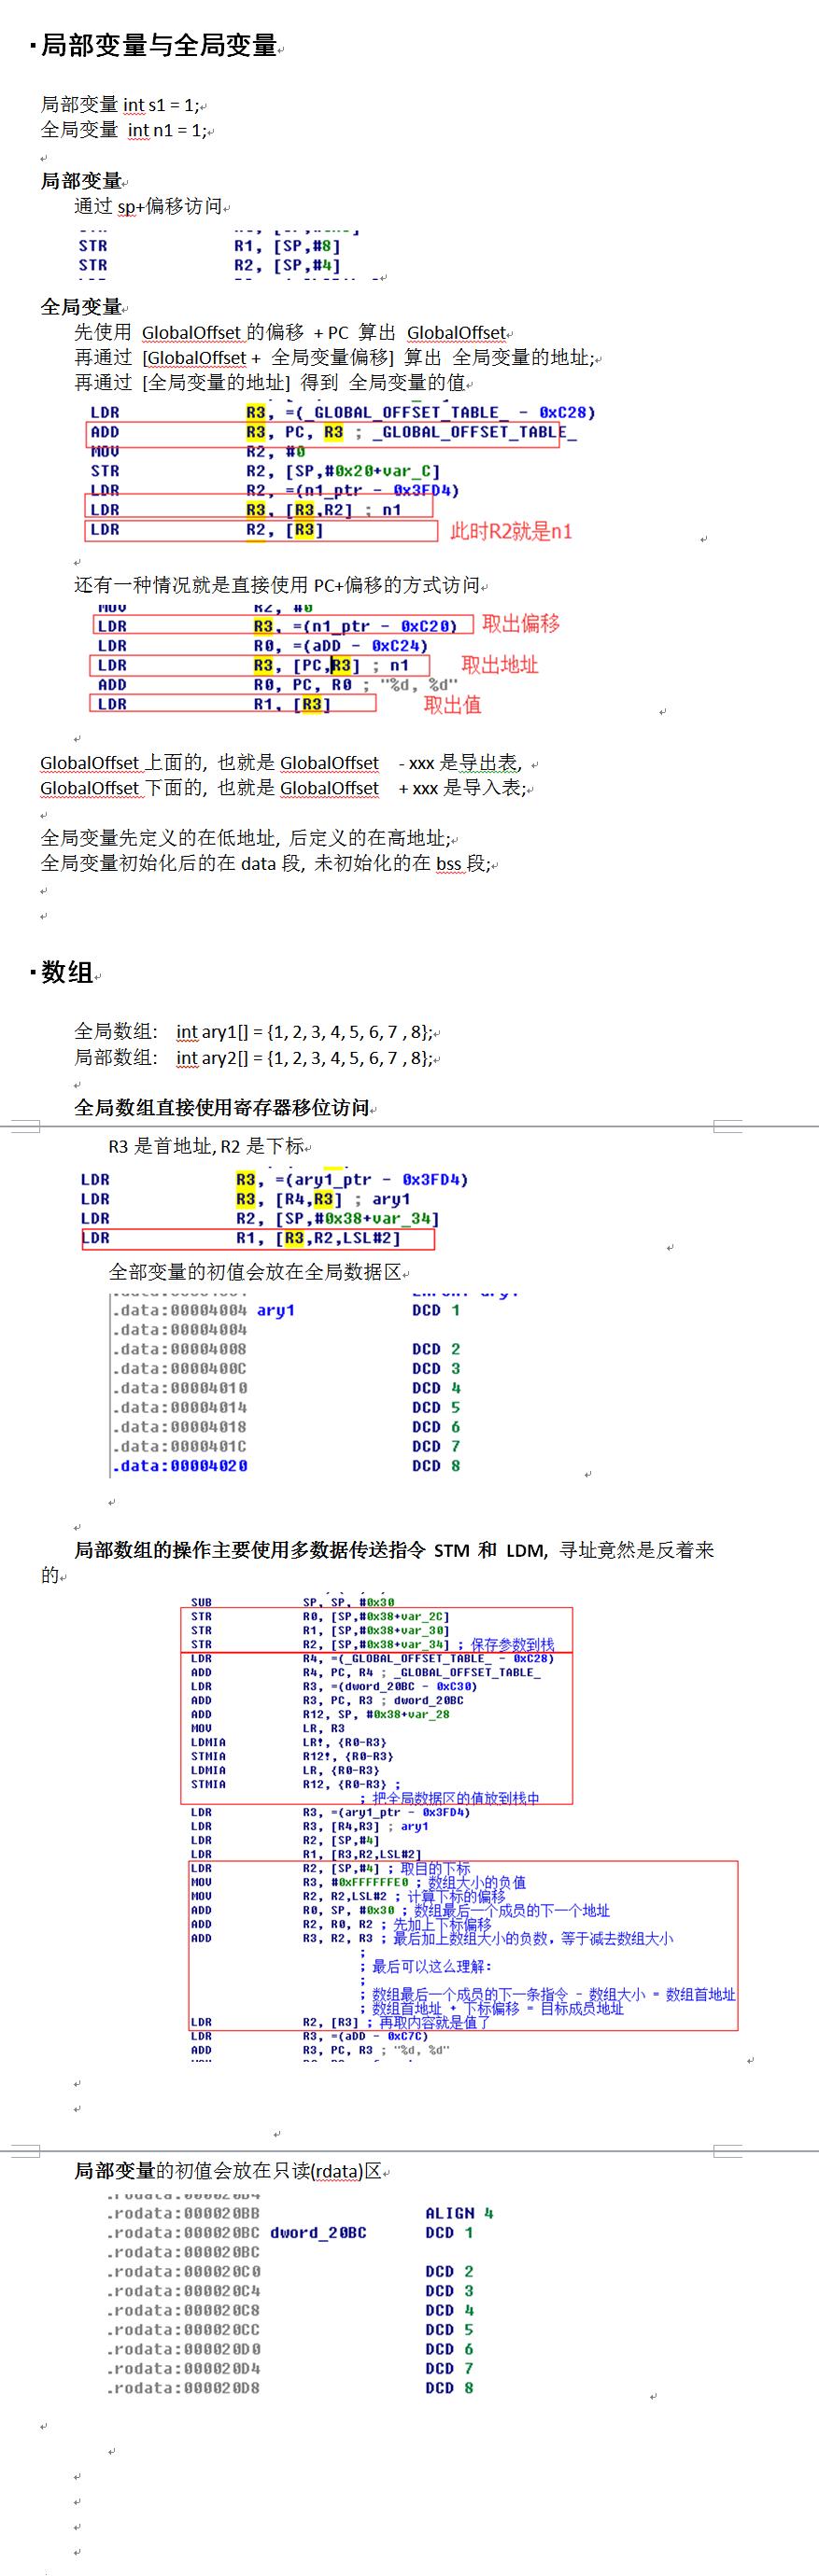 ARM全局和局部变量.png